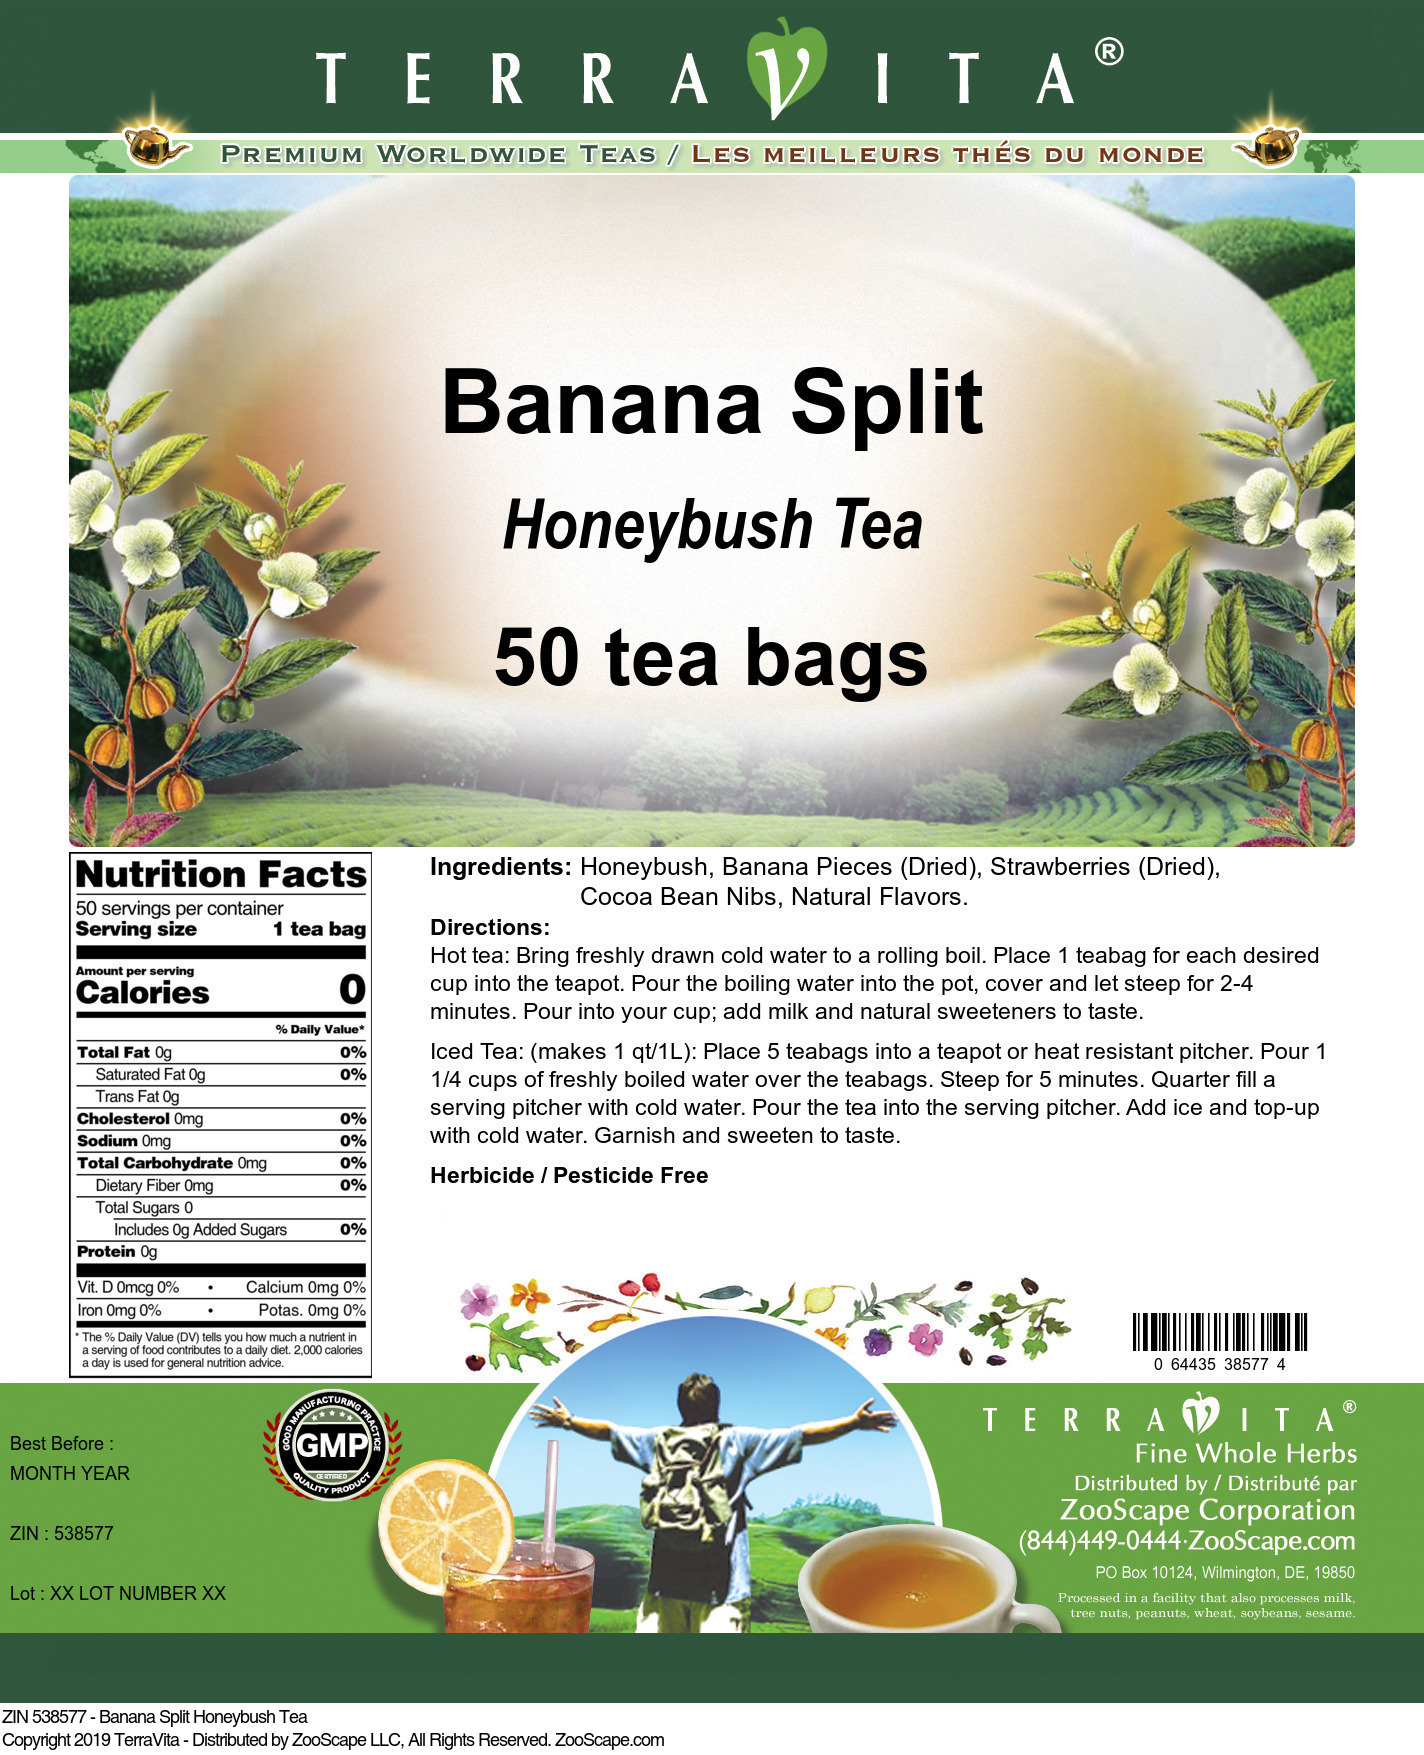 Banana Split Honeybush Tea